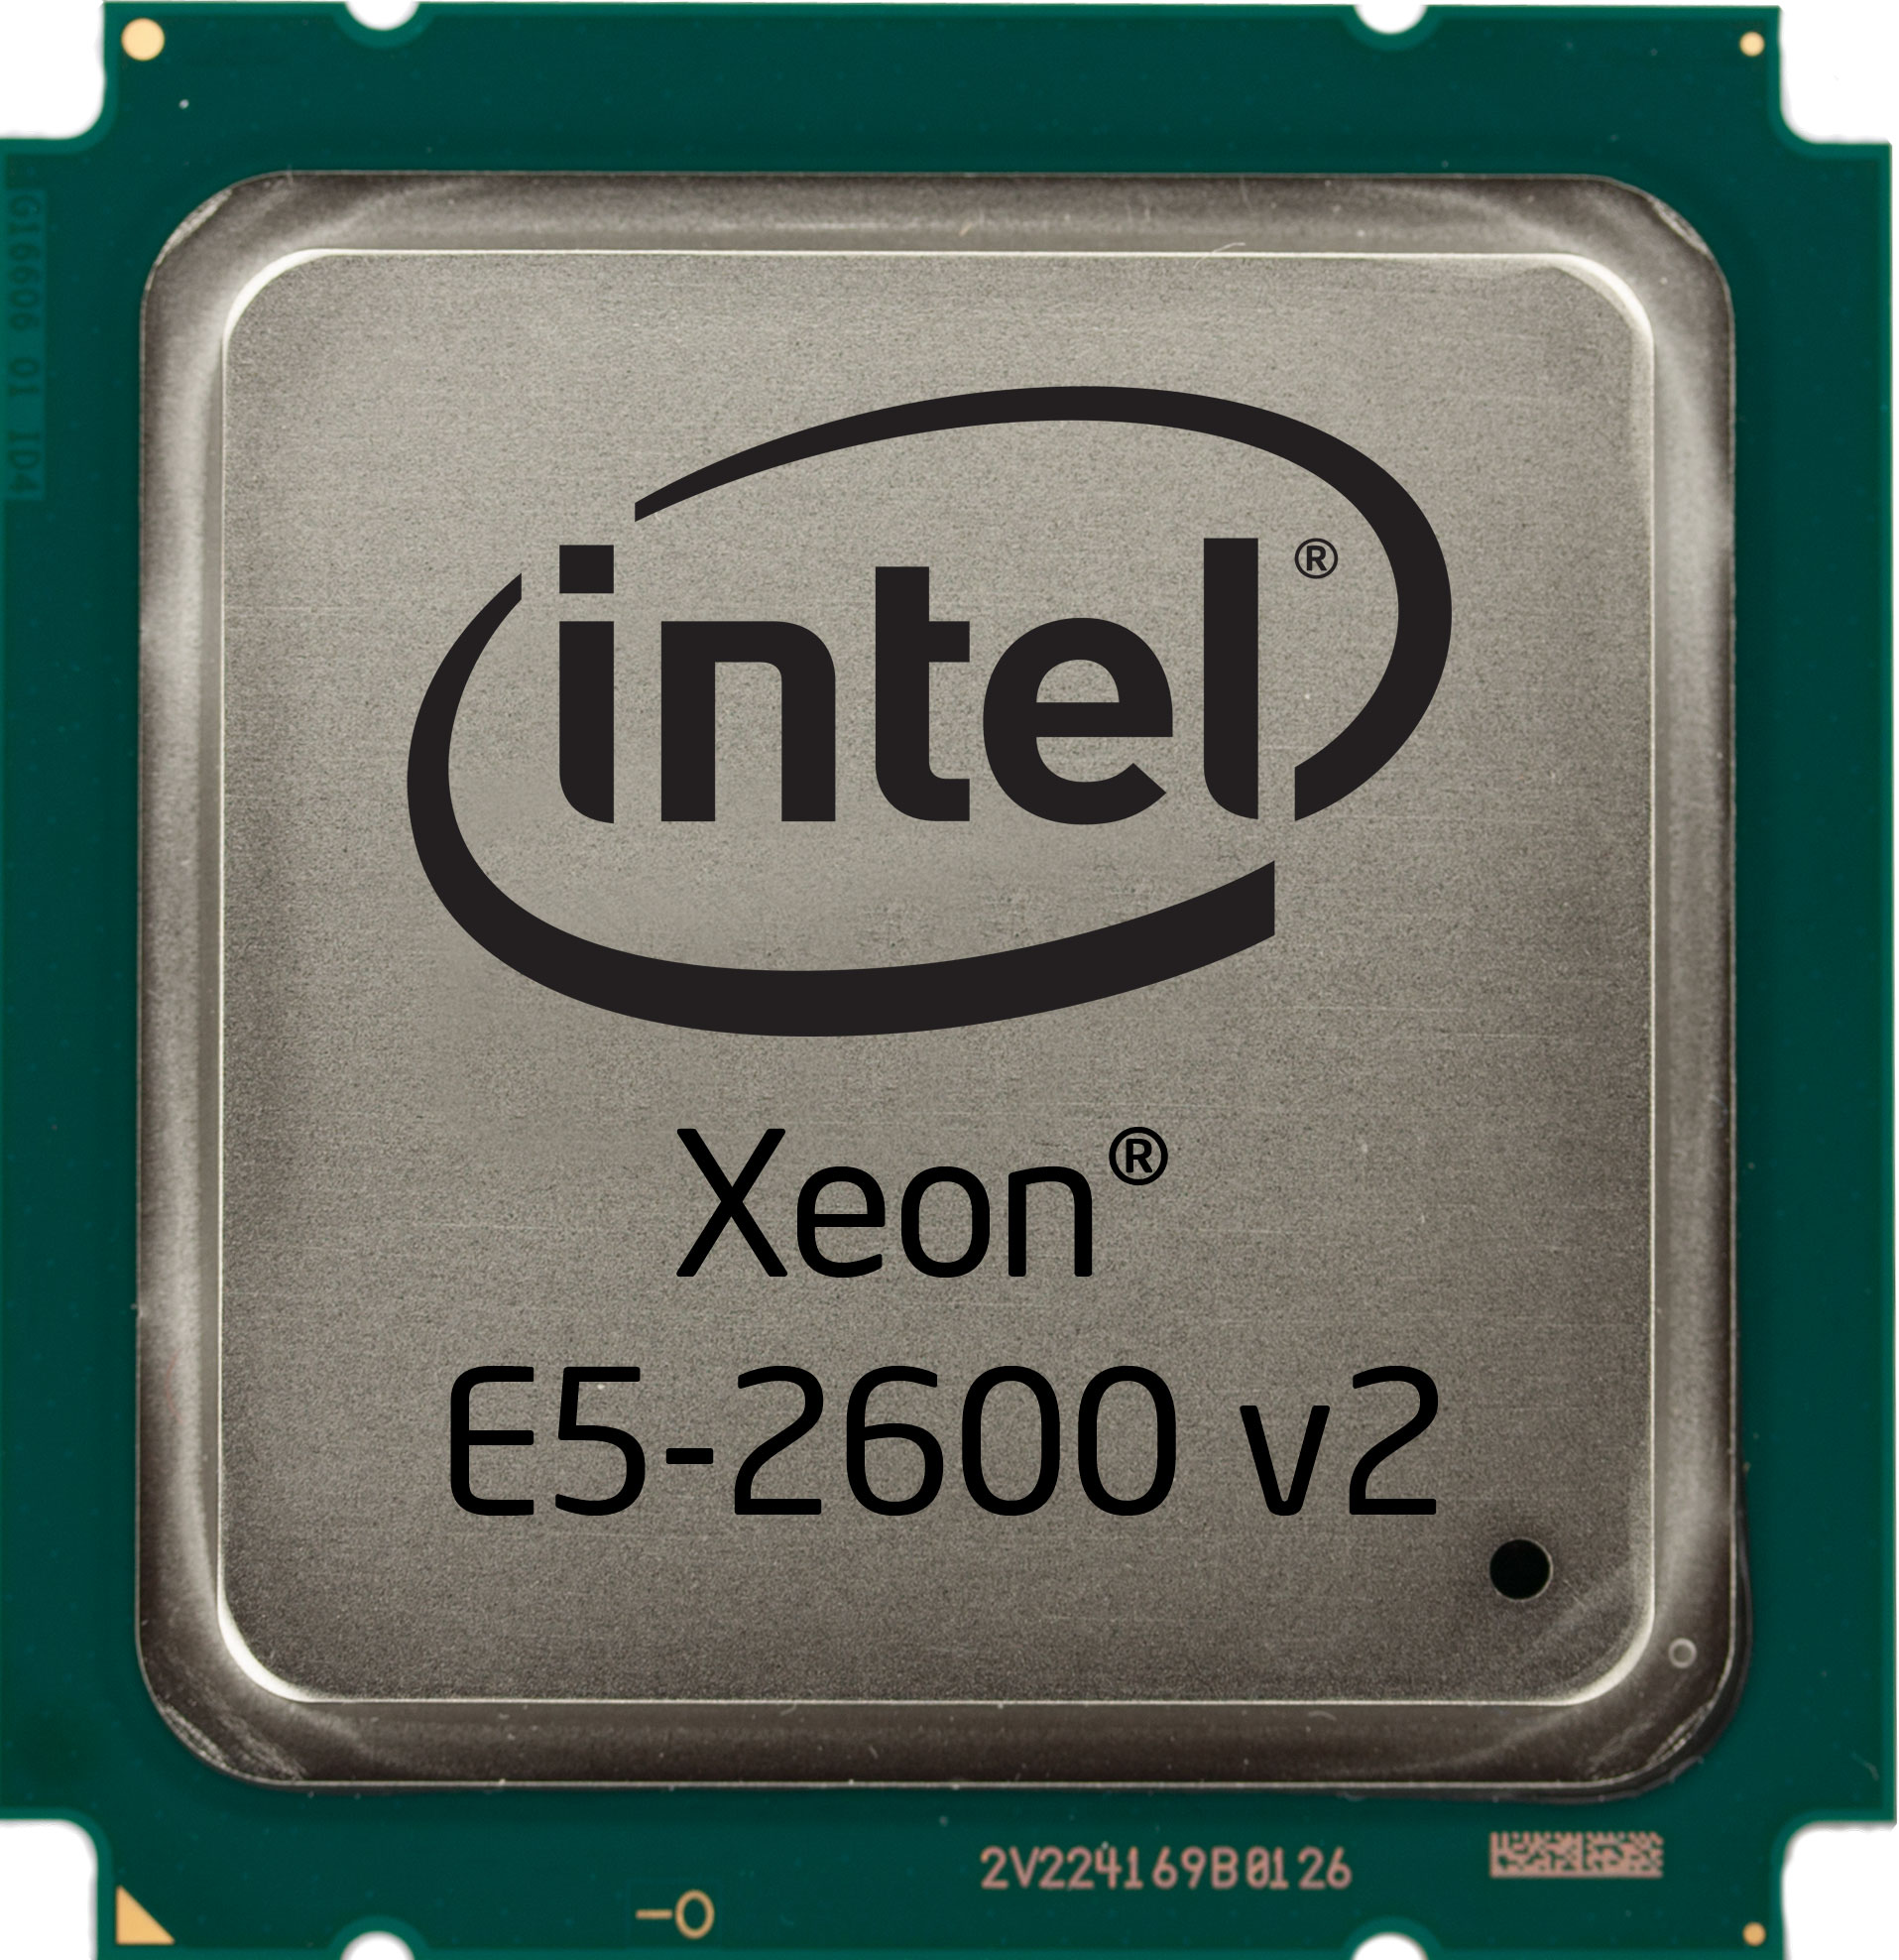 IDF13: Intel Announces The Ivy Bridge-EP Xeon E5-2600 V2